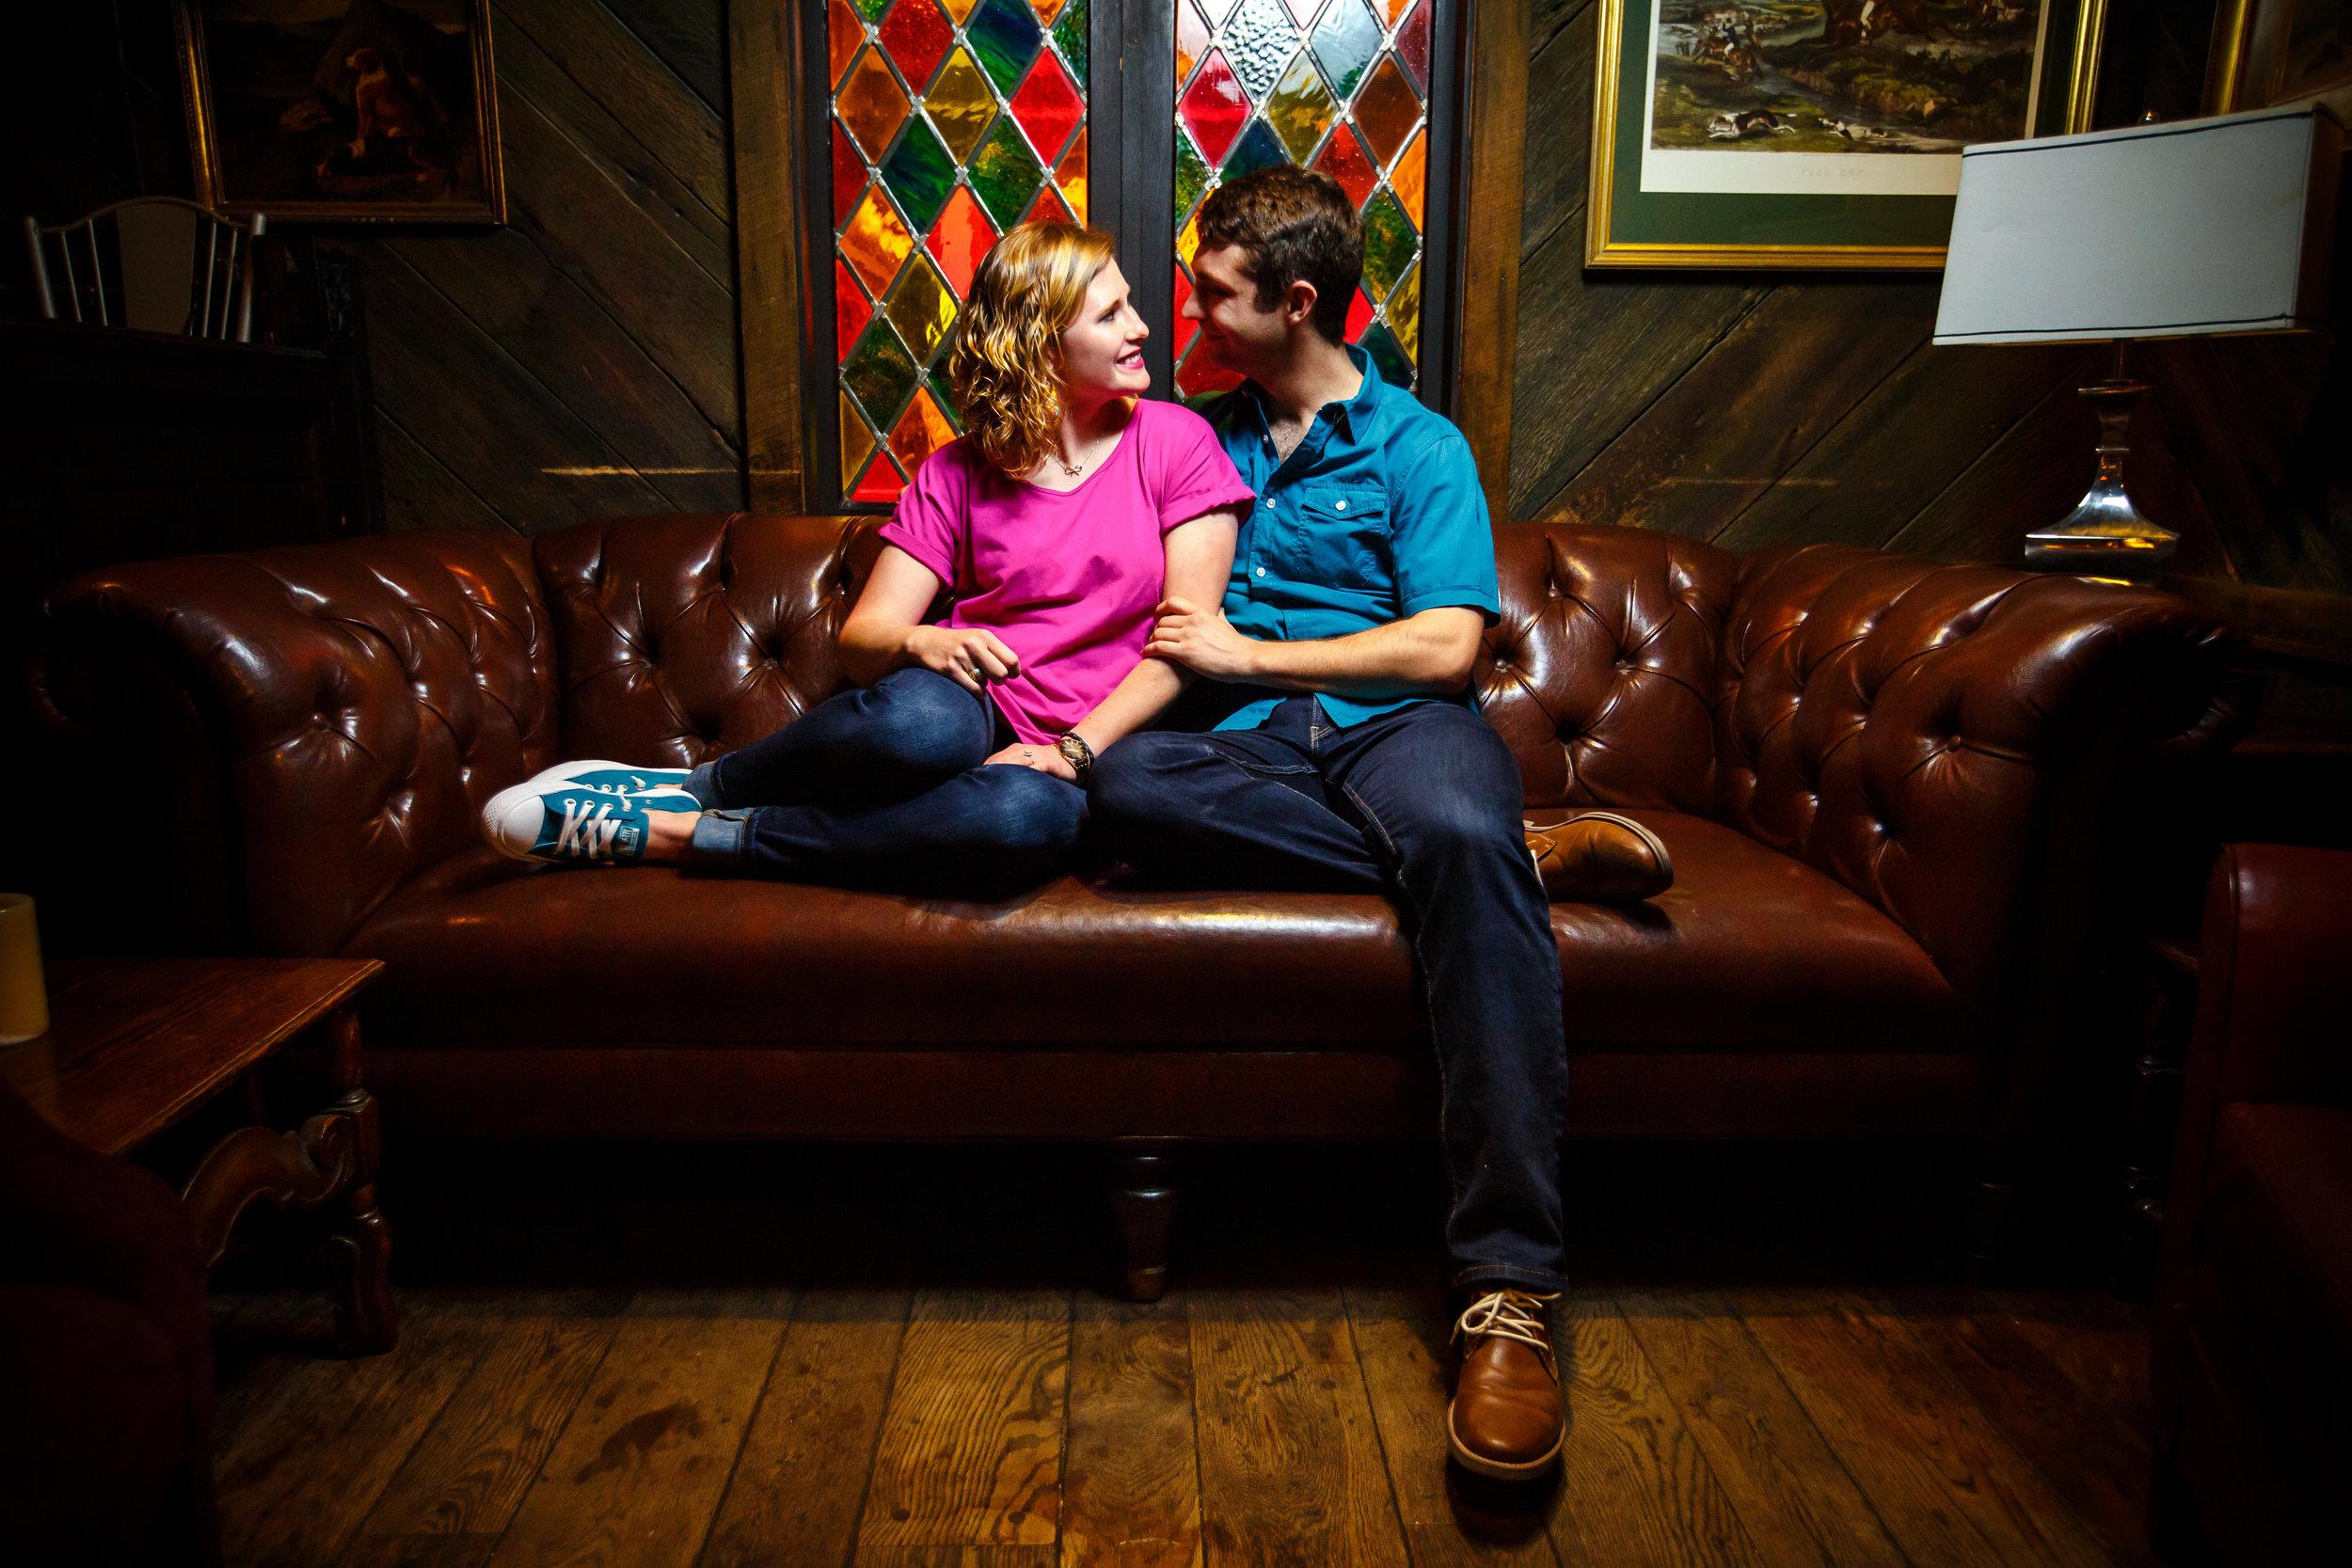 Fox and Hound Cheshire Engagement Photos Oldani Photography St. Louis Wedding Photographers5.jpg